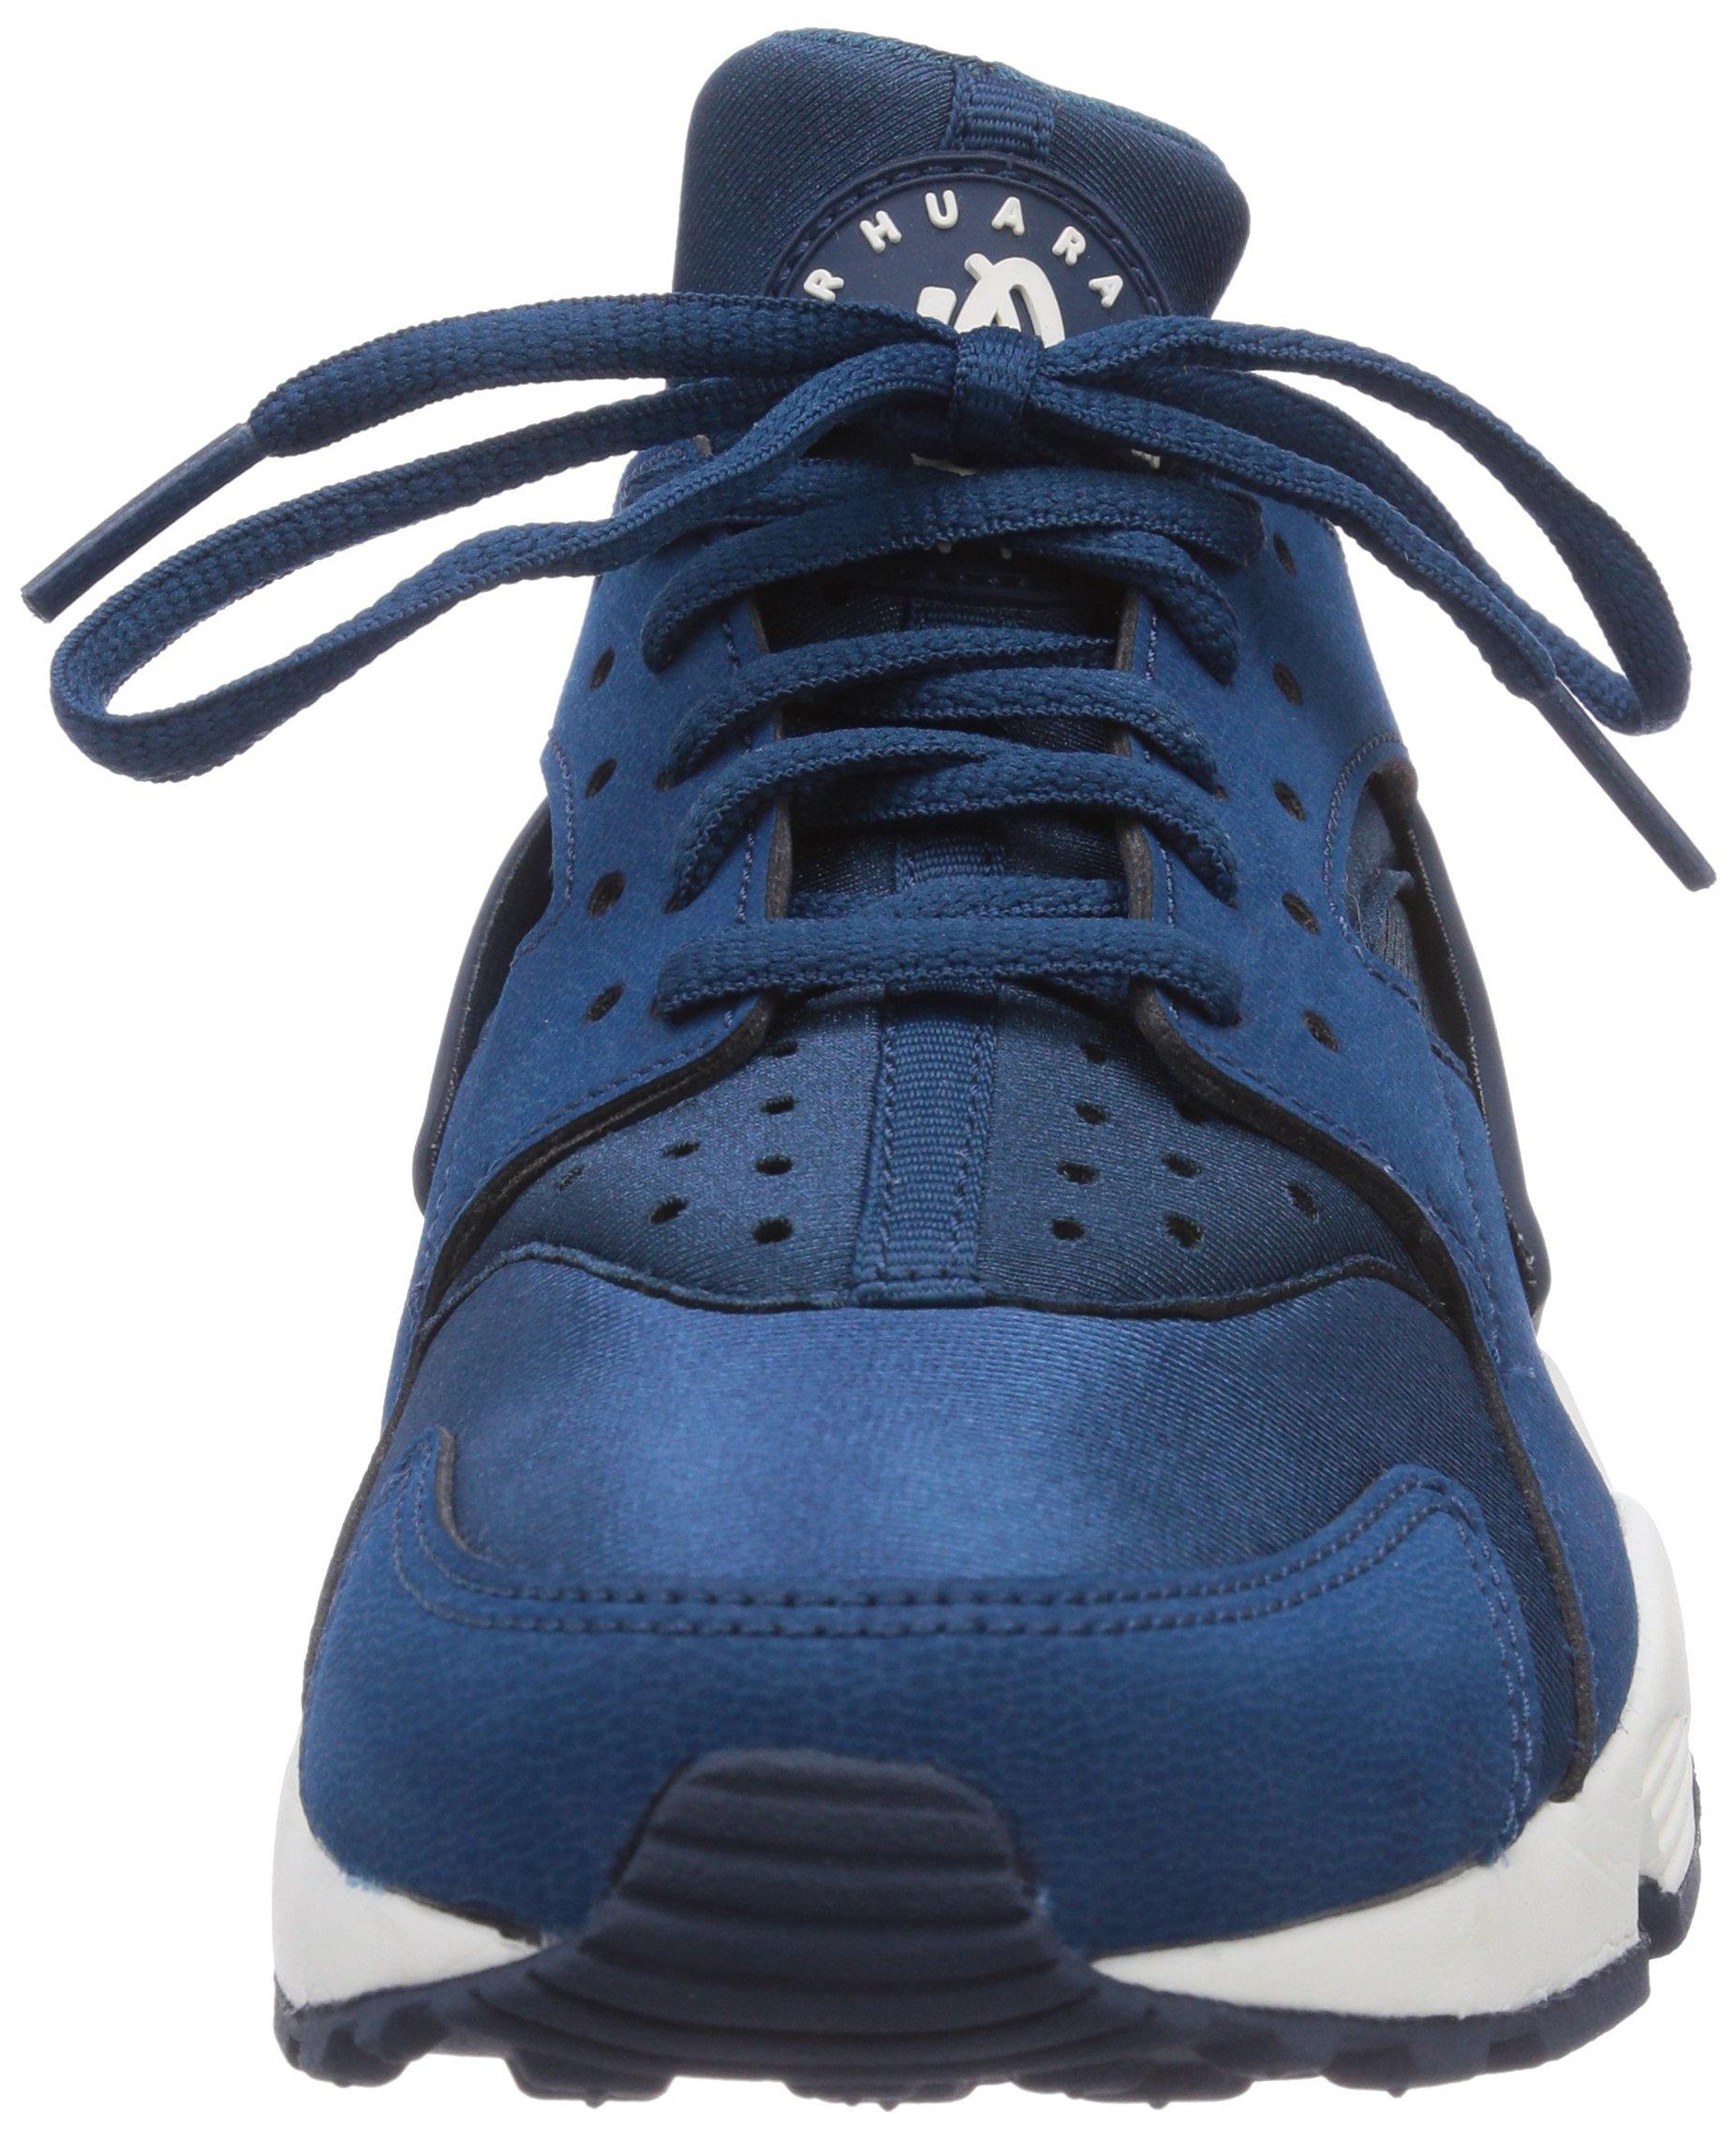 nike womens air huarache trainers 634835 sneakers shoes (UK 3 us 5.5 EU 36, blue force blue force sail 400) by NIKE (Image #4)